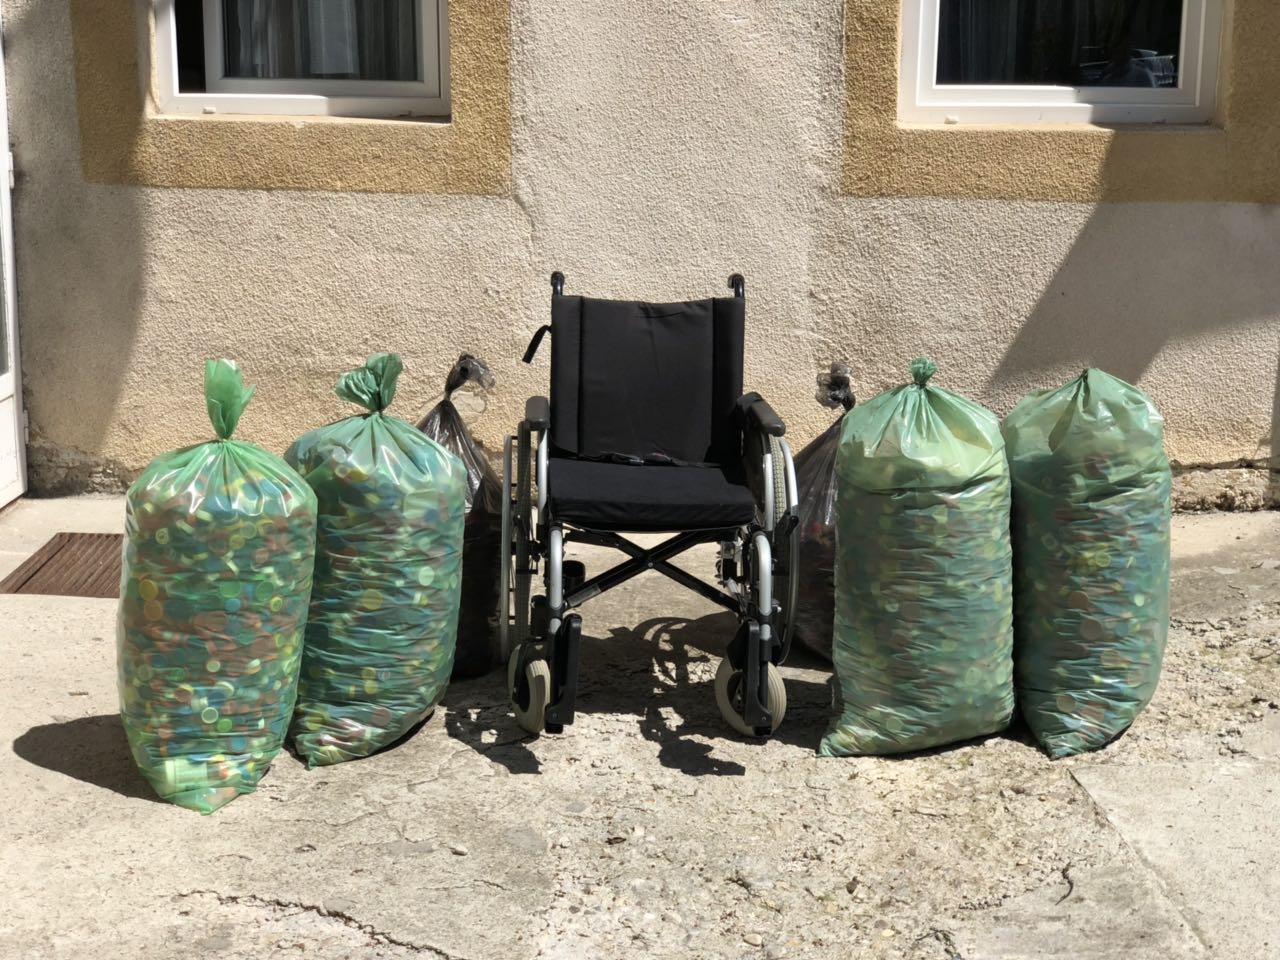 Invalidska kolica, čepovi, foto: RBS